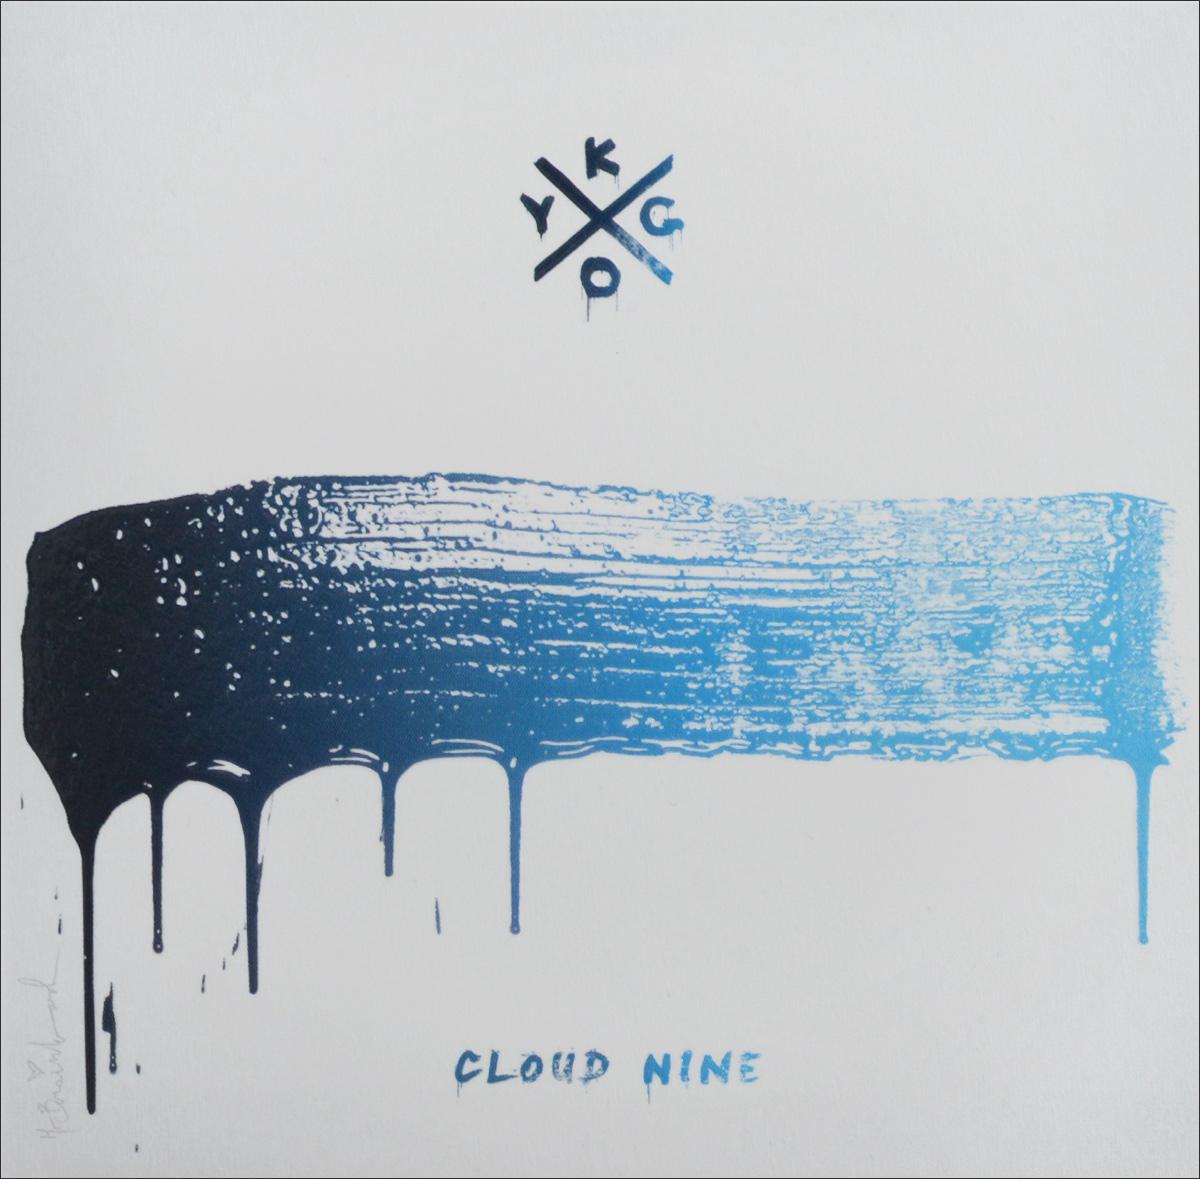 Kygo. Cloud Nine